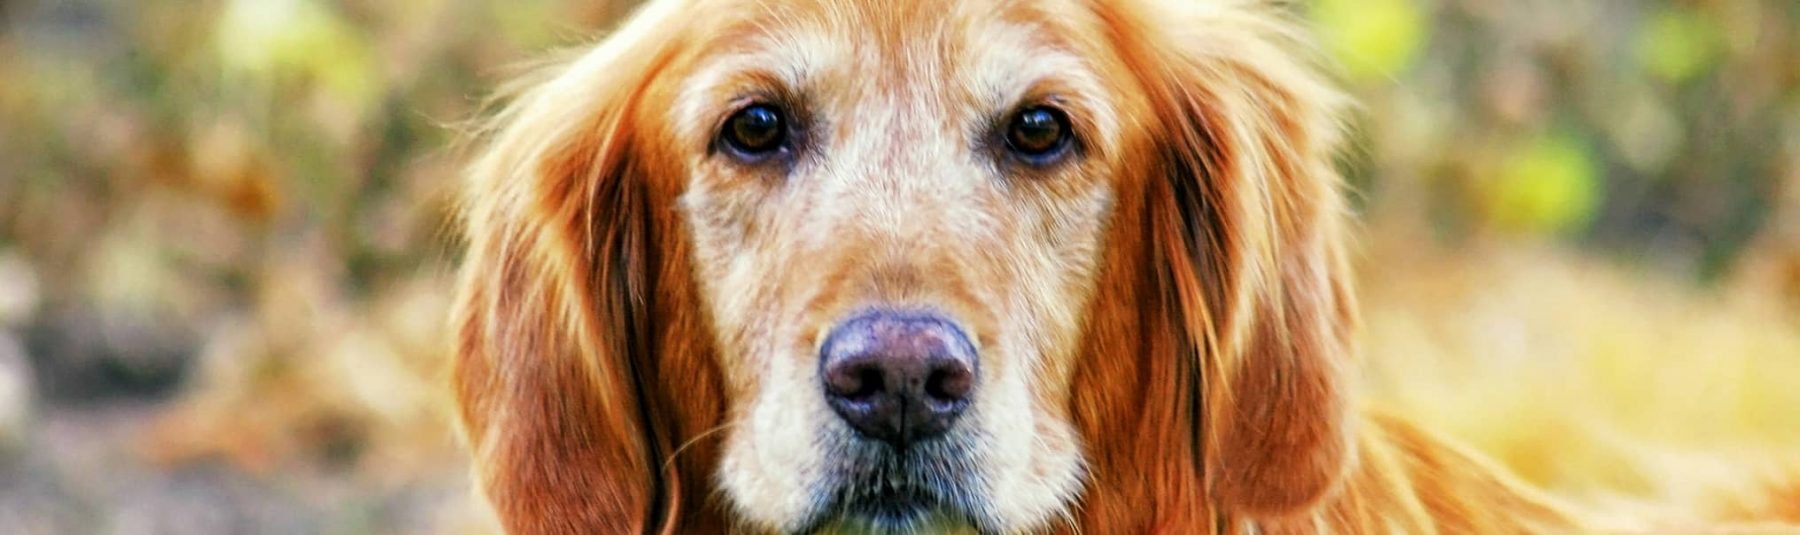 Senior Dog Services